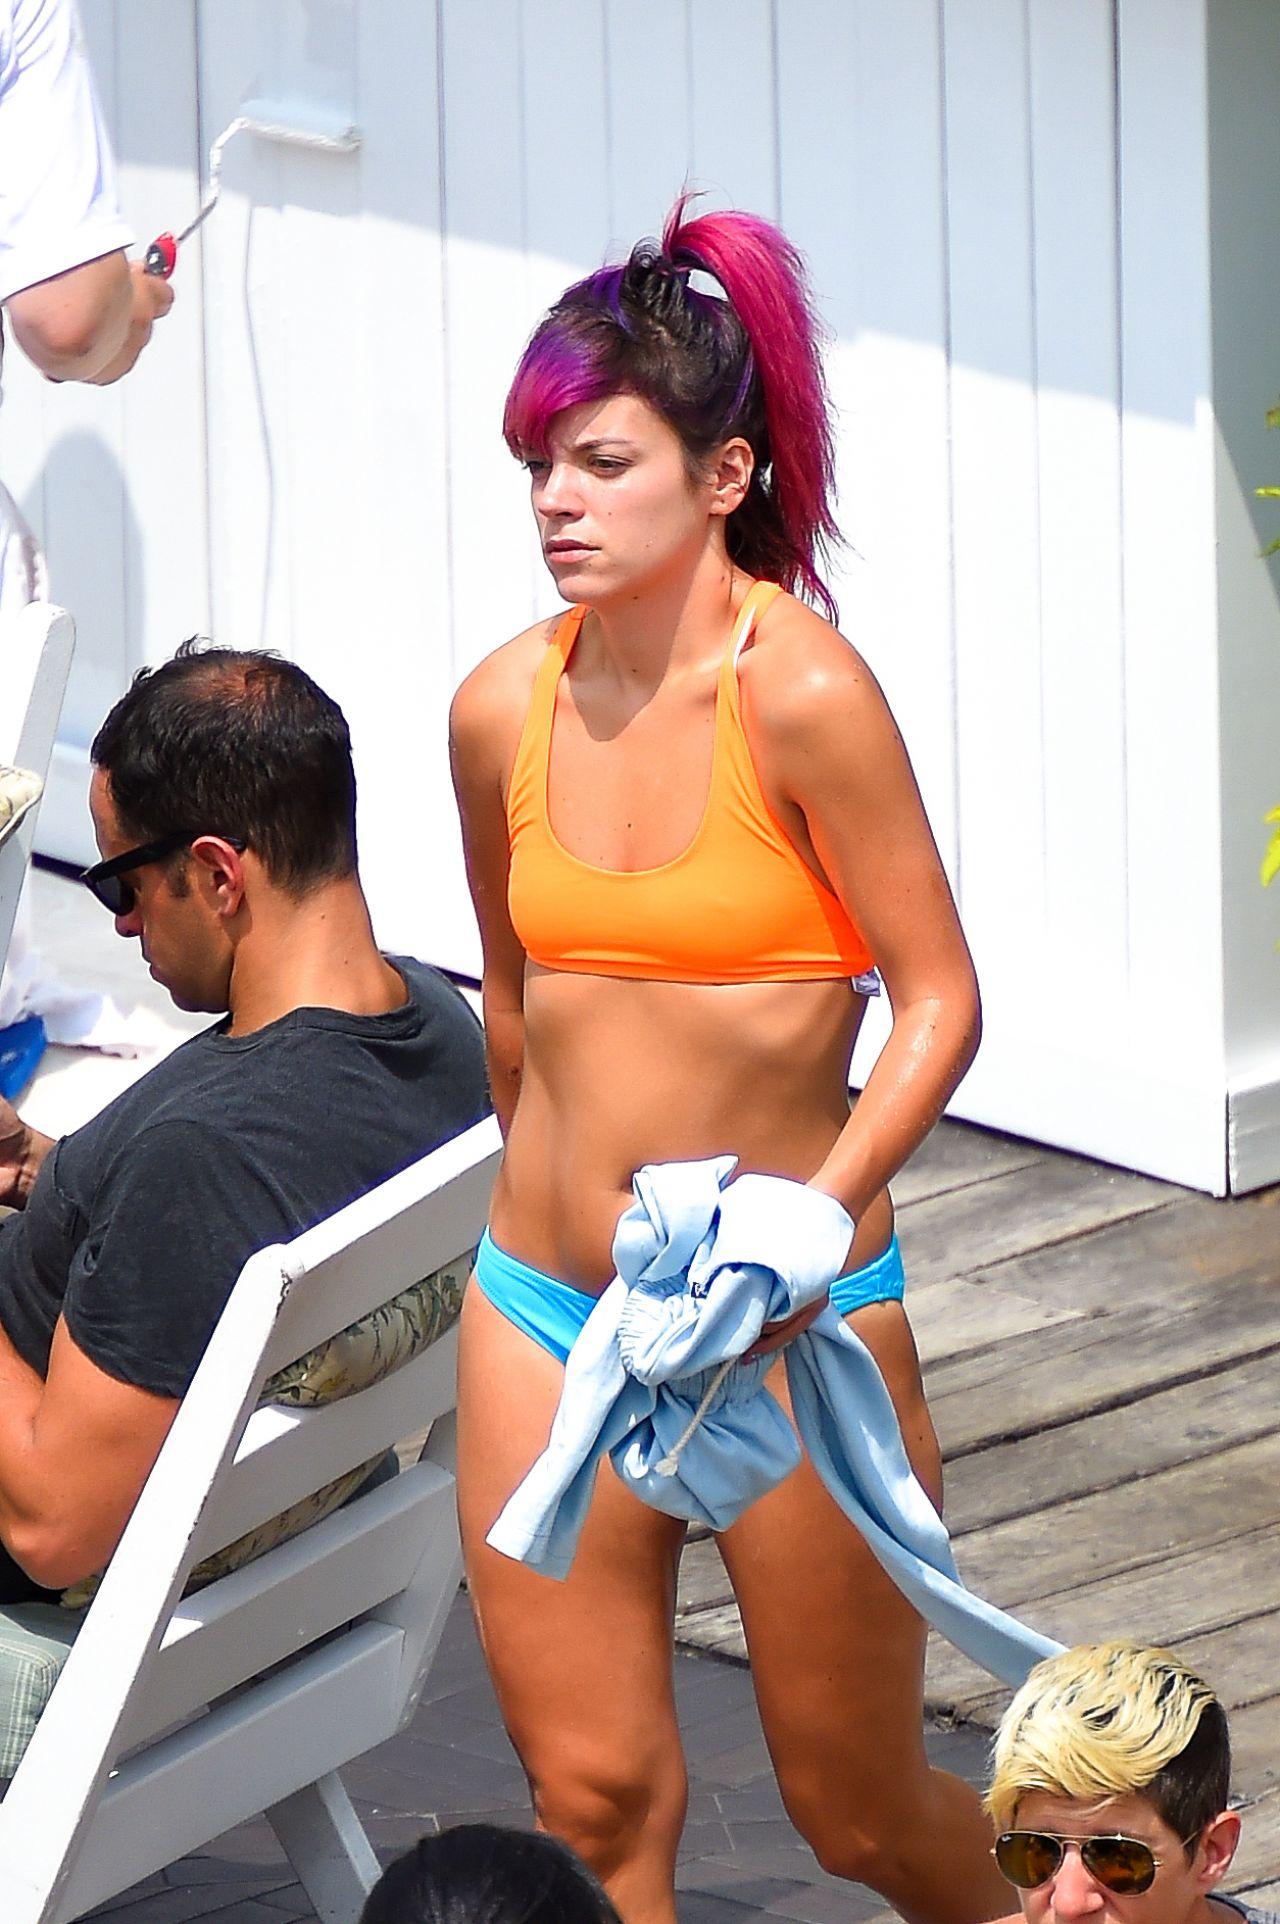 Lily Allen Bikini Candids at a Hotel Pool in New York